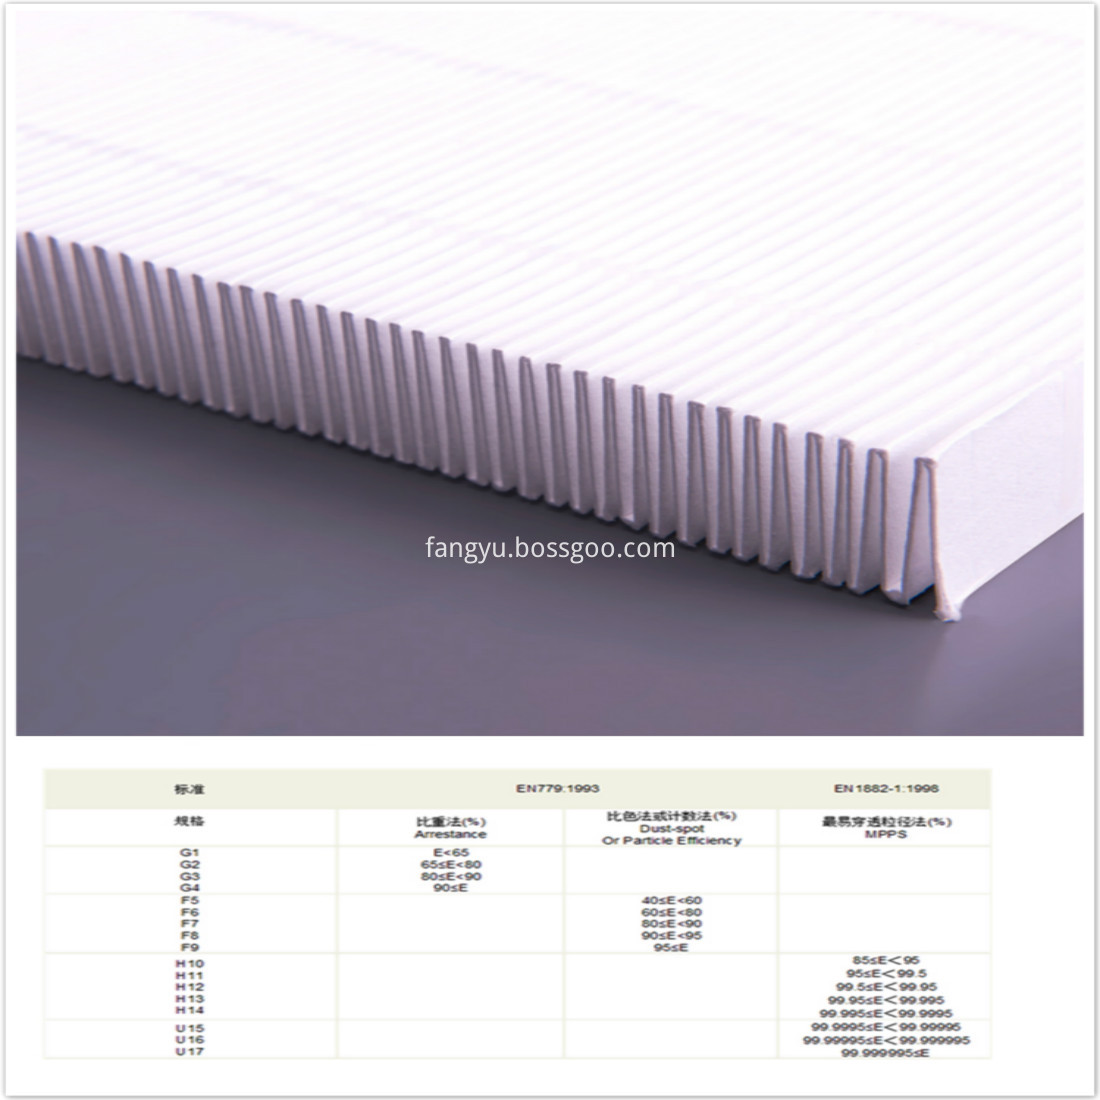 Fiberglass air filter paper index data